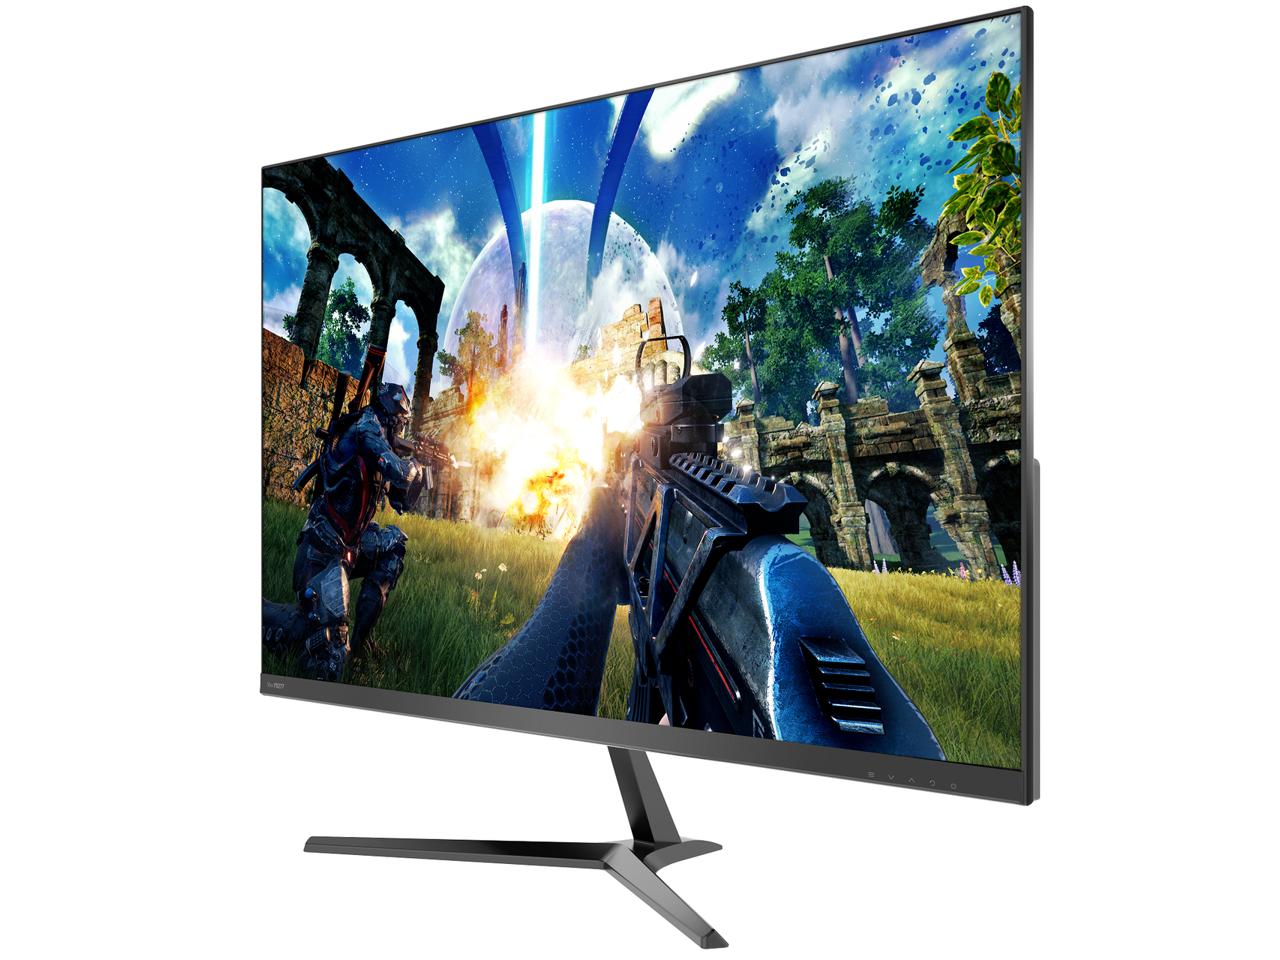 New PX277 27 inch 144Hz AMD Freesync Adaptive sync WQHD 2560 x 1440 Wide Screen Bezel Less Display Professional IPS (AH-VA) Gaming Monitor $299